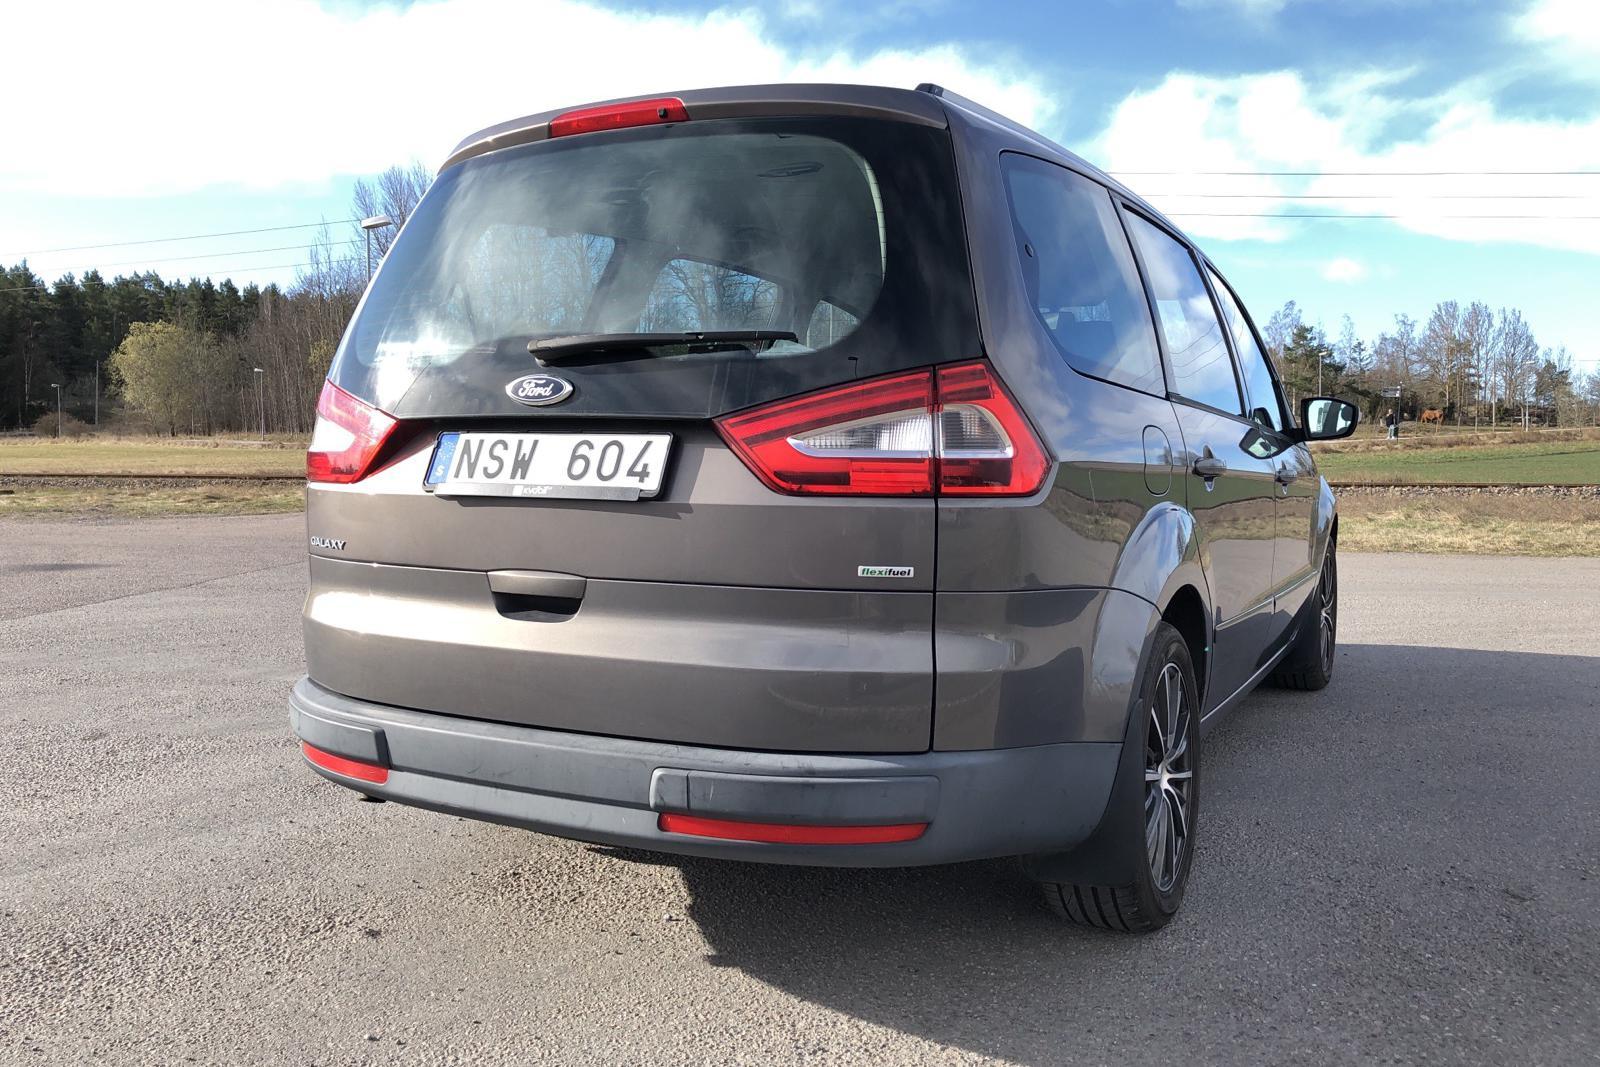 Ford Galaxy 2.0 Flexifuel (145hk) - 260 200 km - Manual - brown - 2012